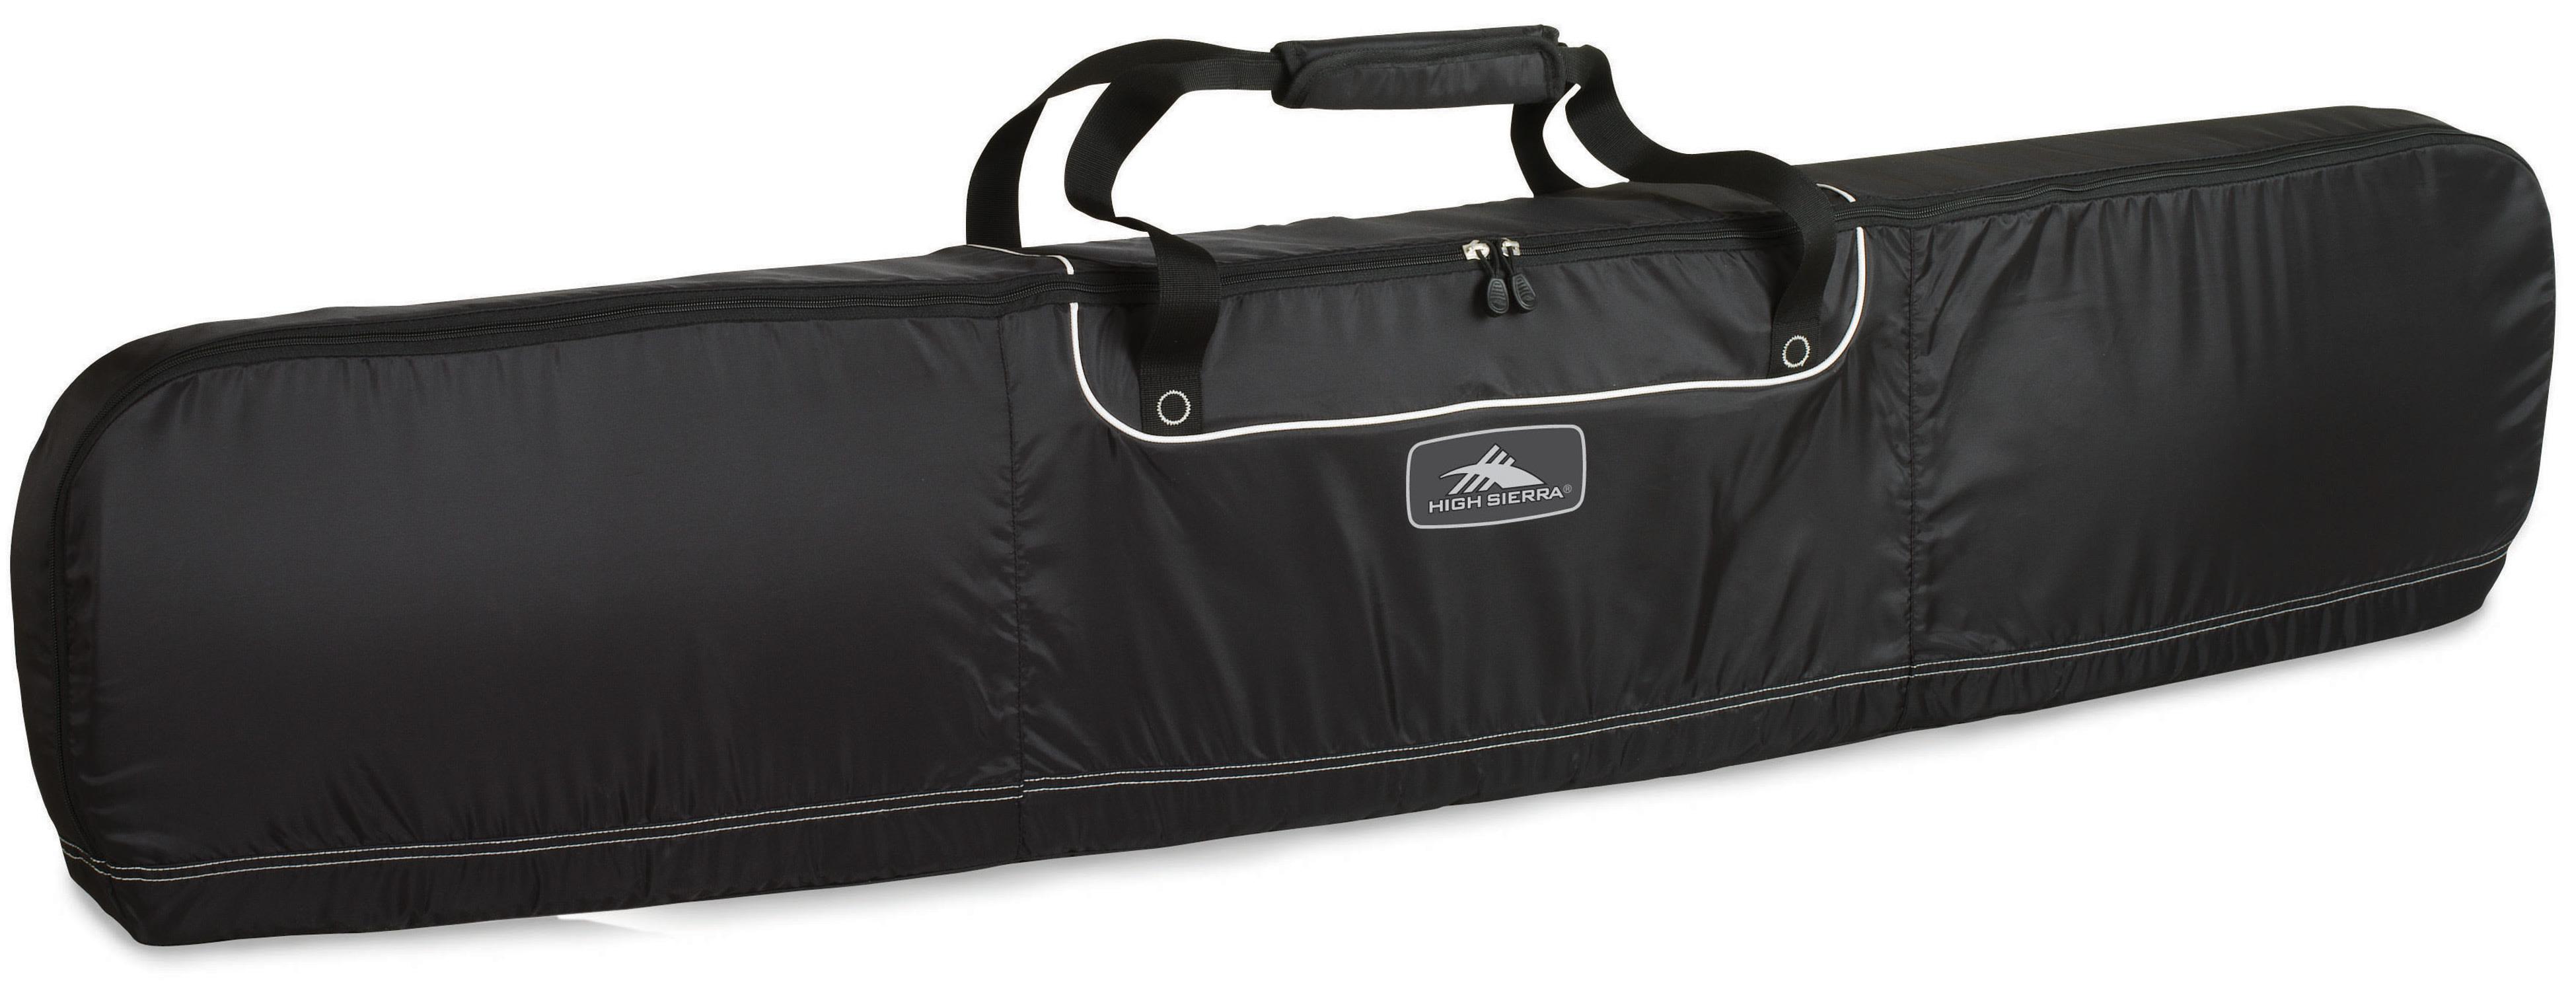 a05af2701efd High Sierra Basic Sleeve Snowboard Bag